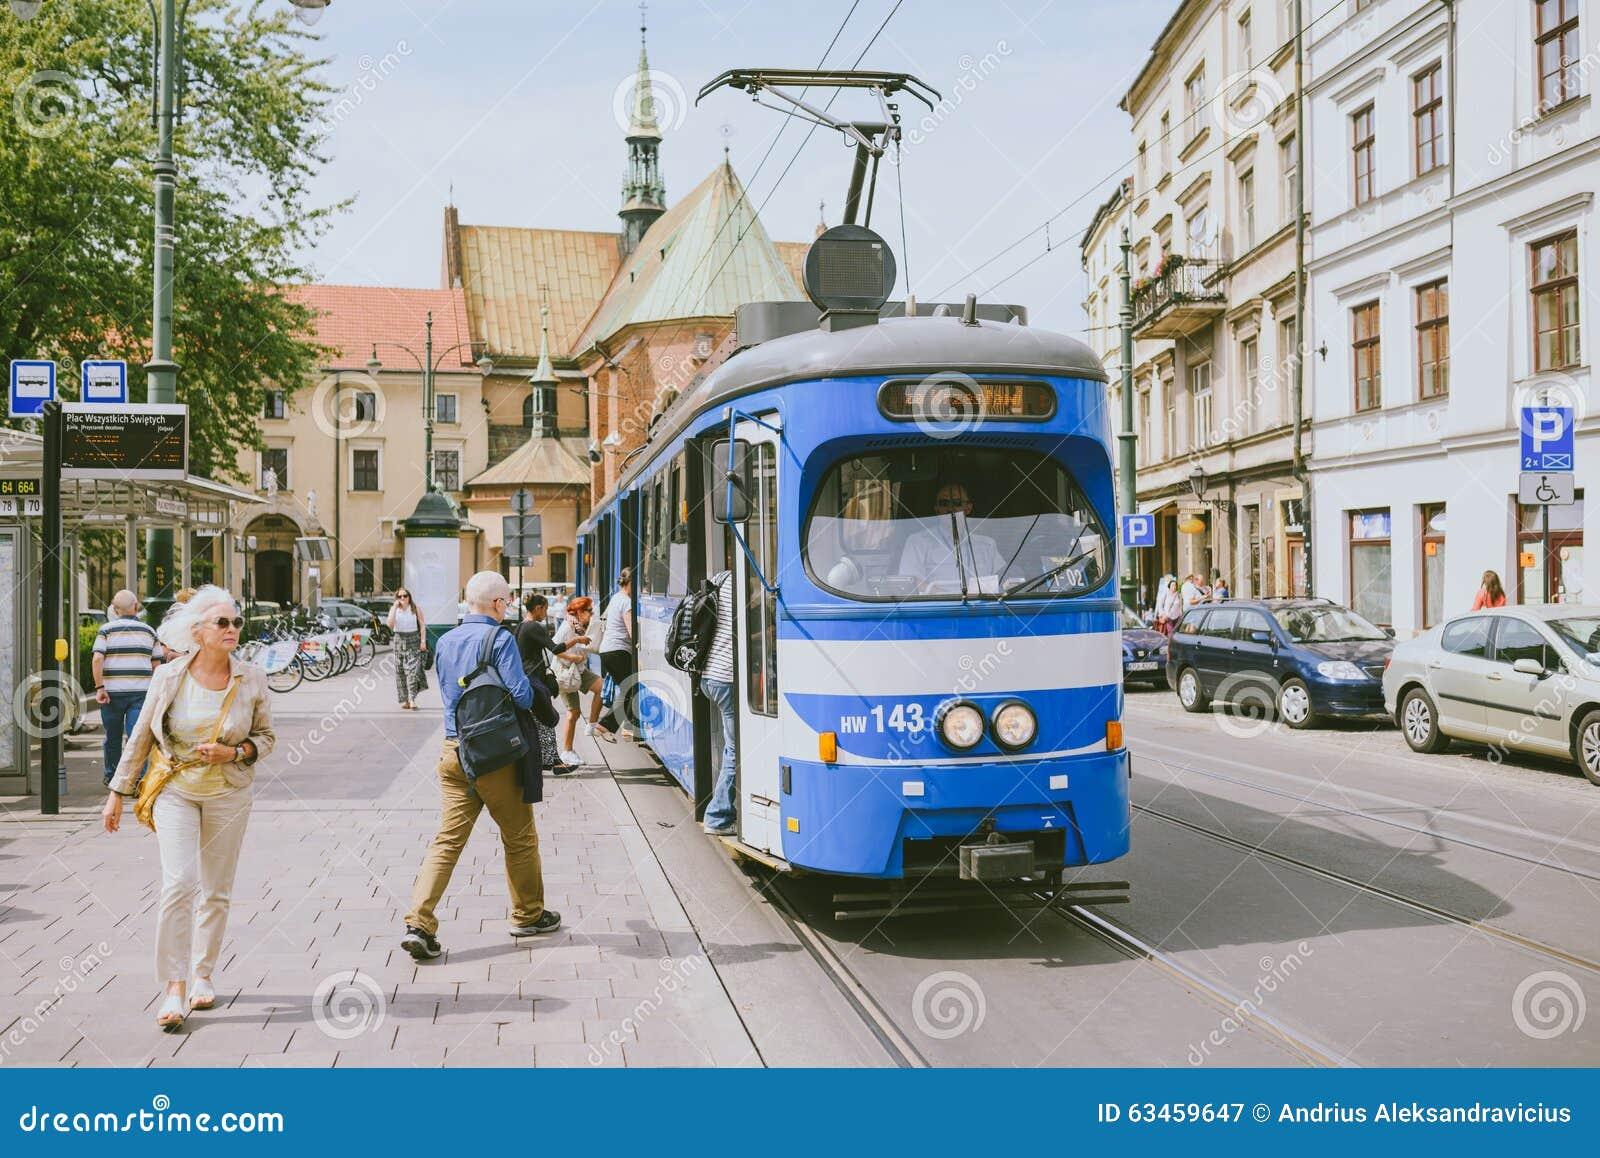 Train Travel Time From Krakow